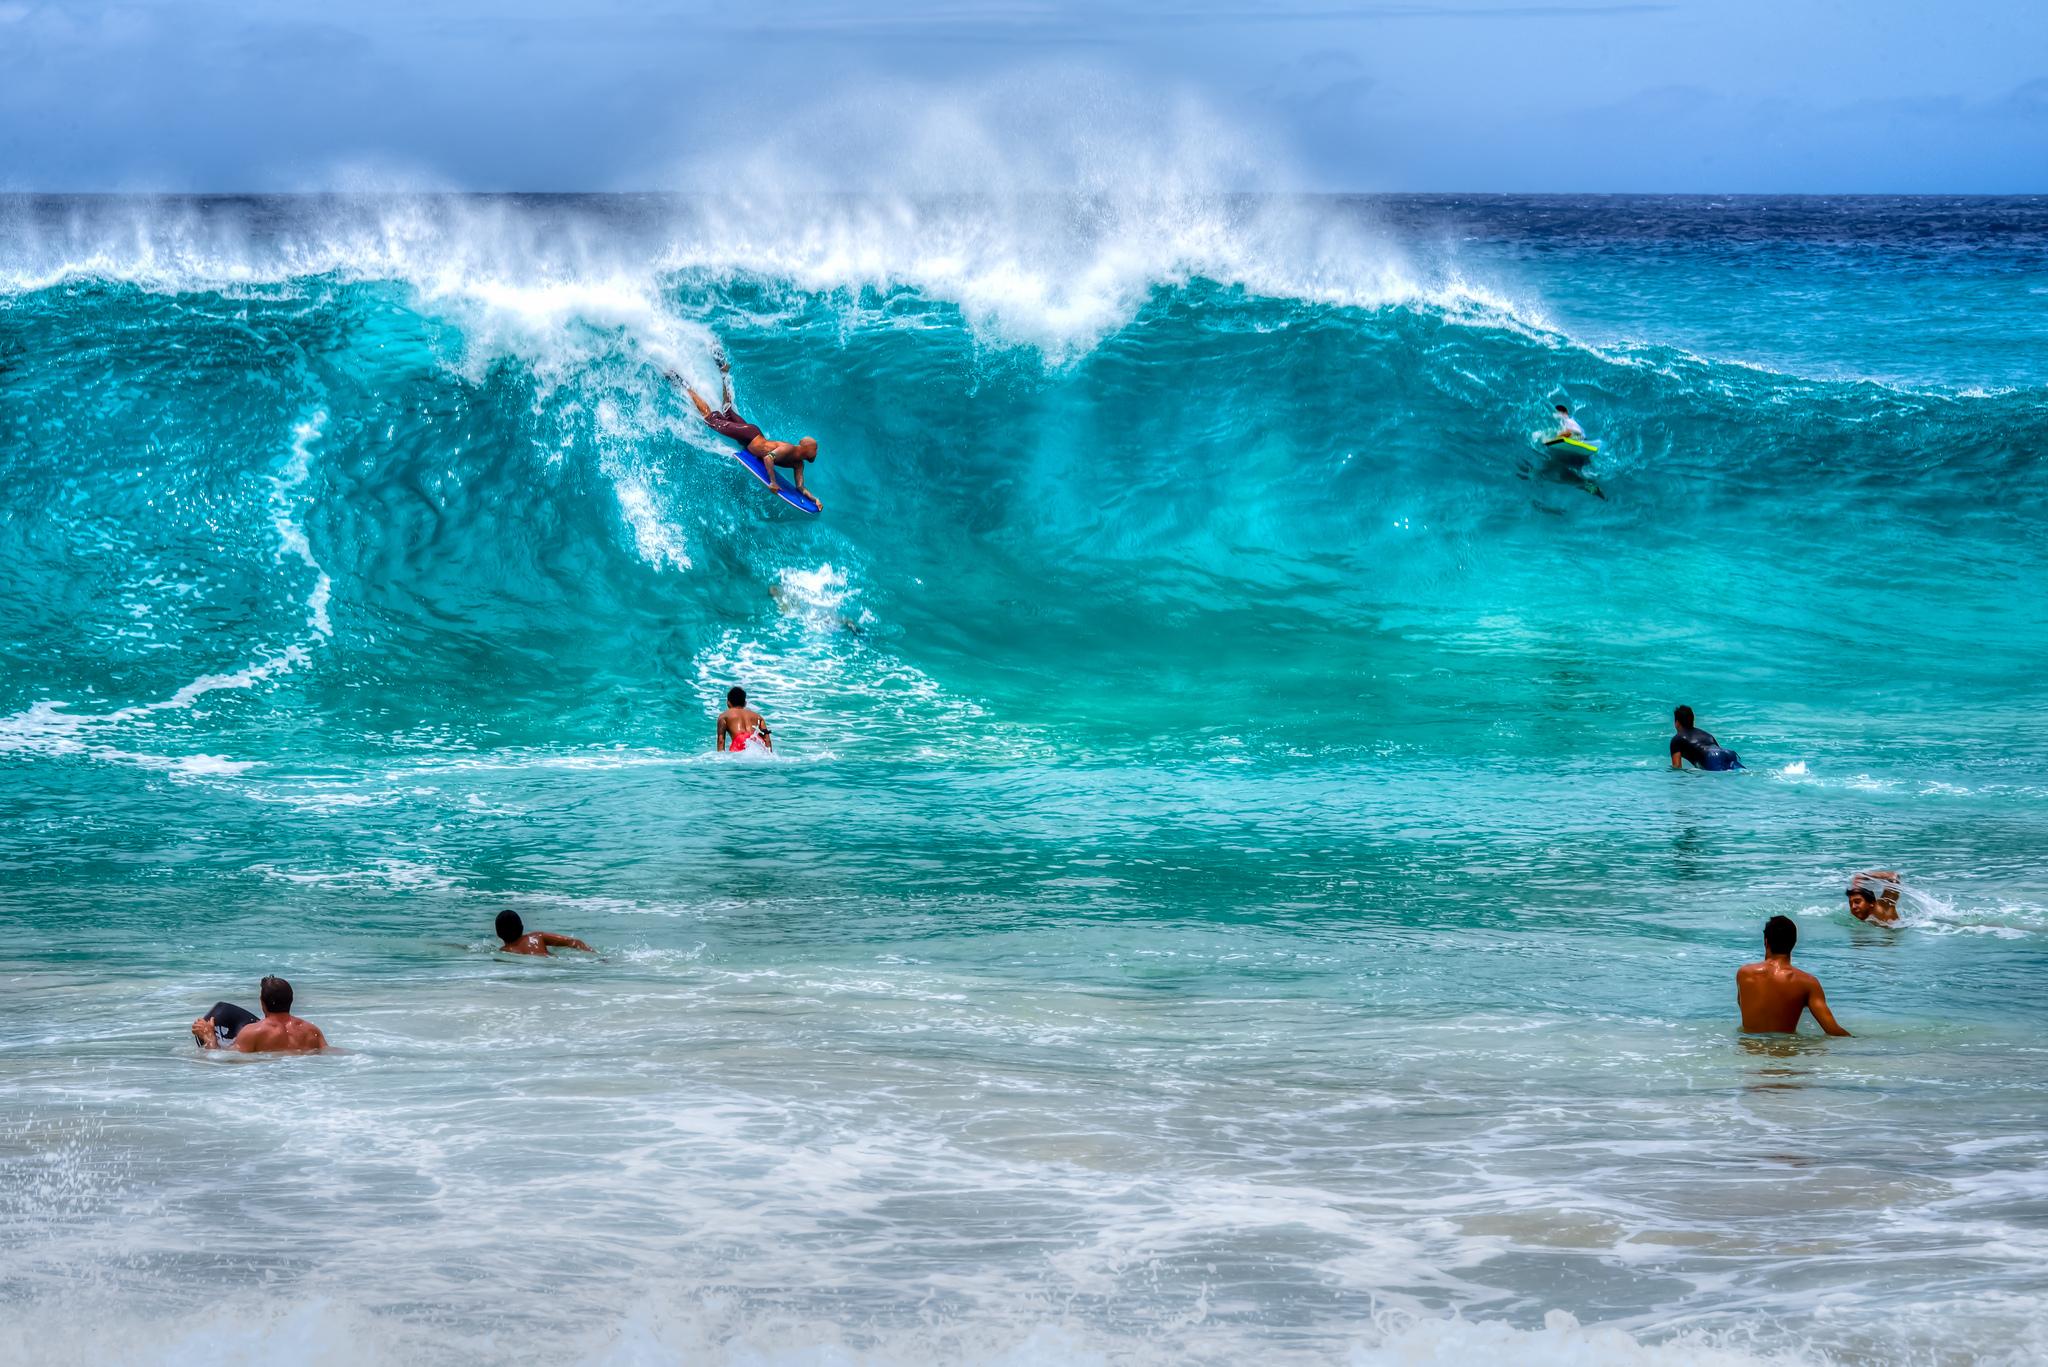 Sandy Beach at Oahu, Hawaii| ©Floyd Manzano /Flickr